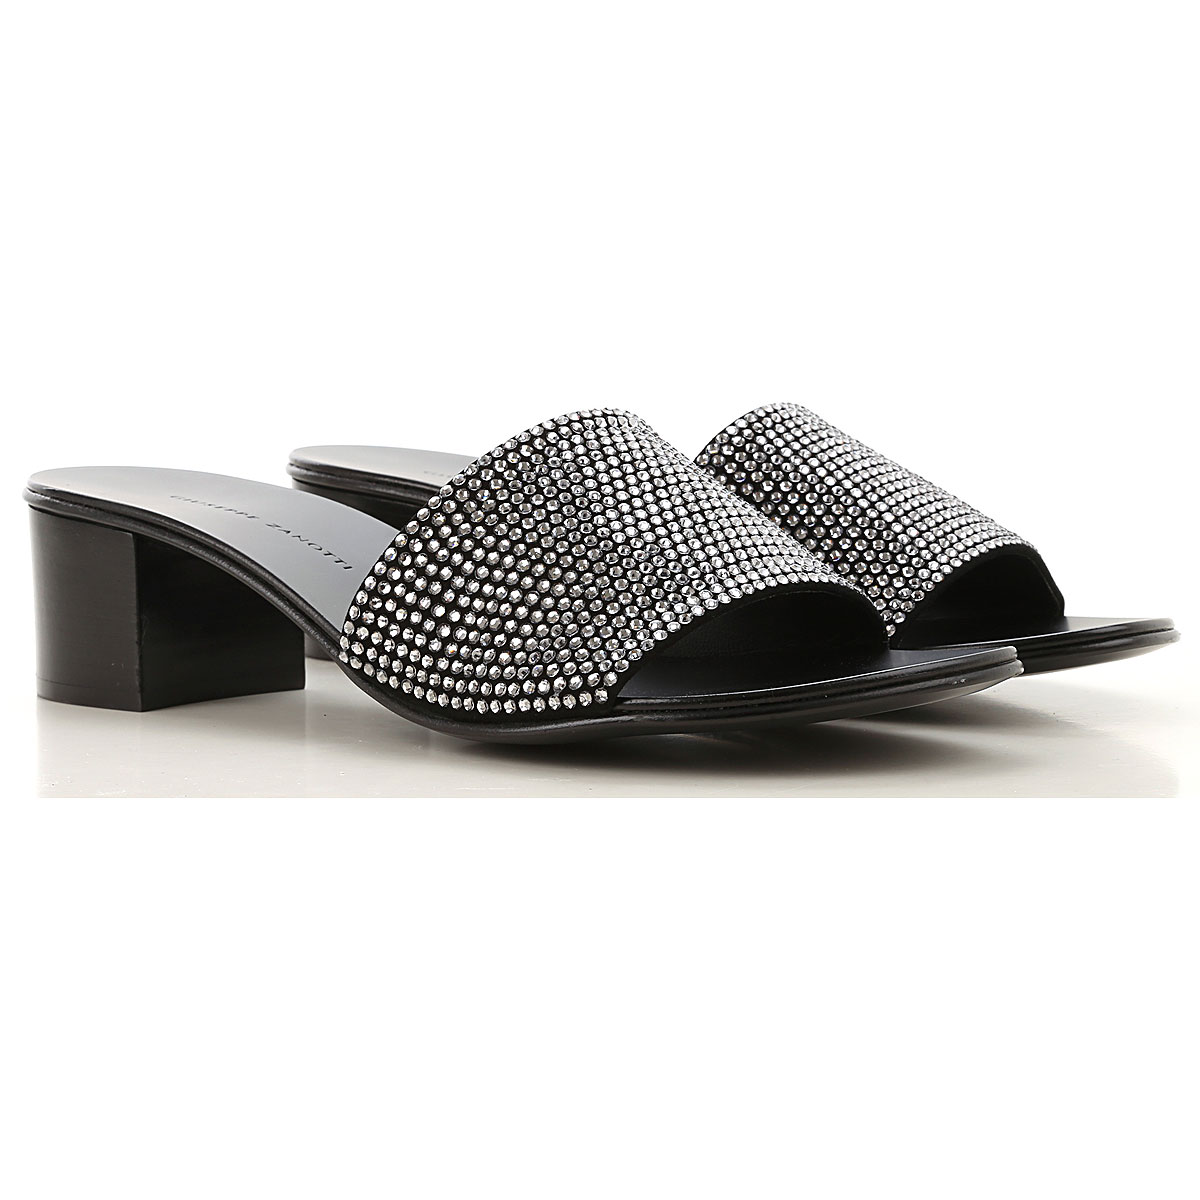 Giuseppe Zanotti Design Sandals for Women On Sale, Black, Leather, 2019, 6 7 8 8.5 9